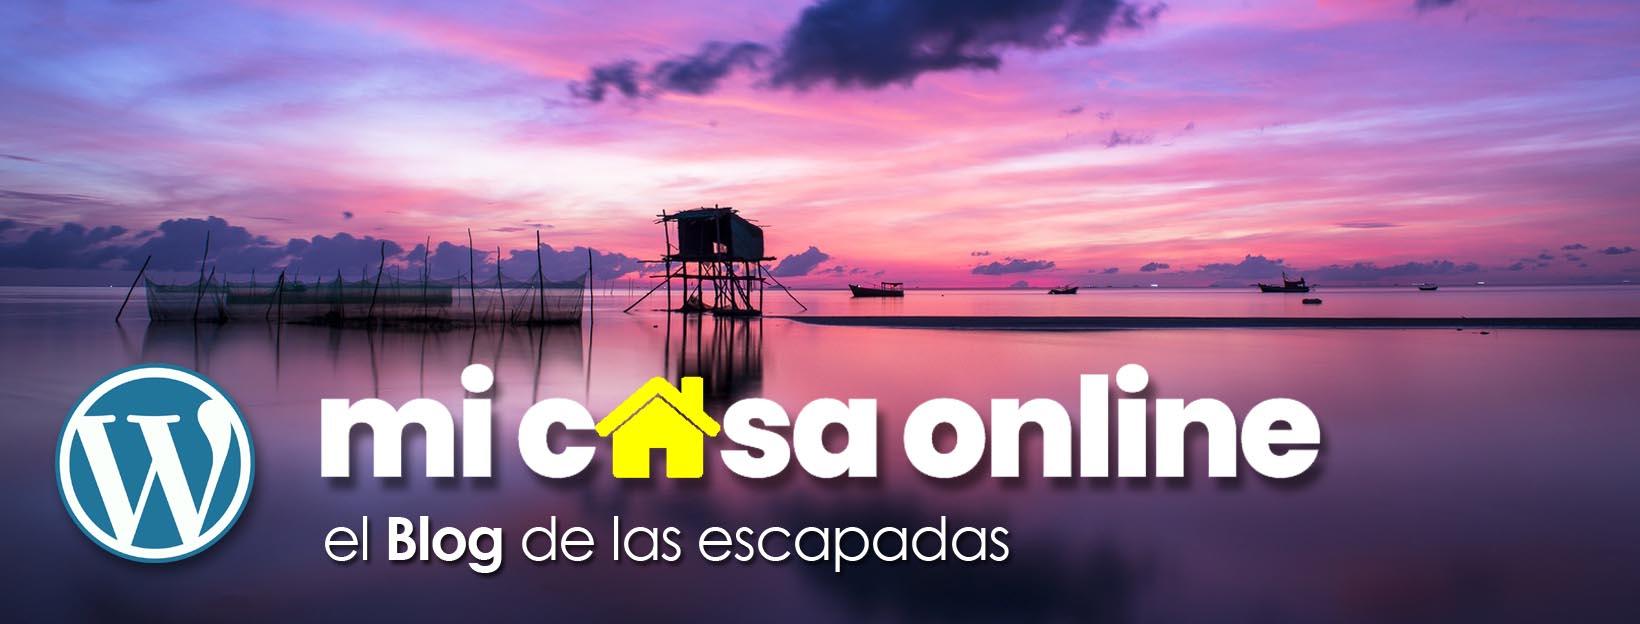 MI CASA ONLINE - Blog corporativo